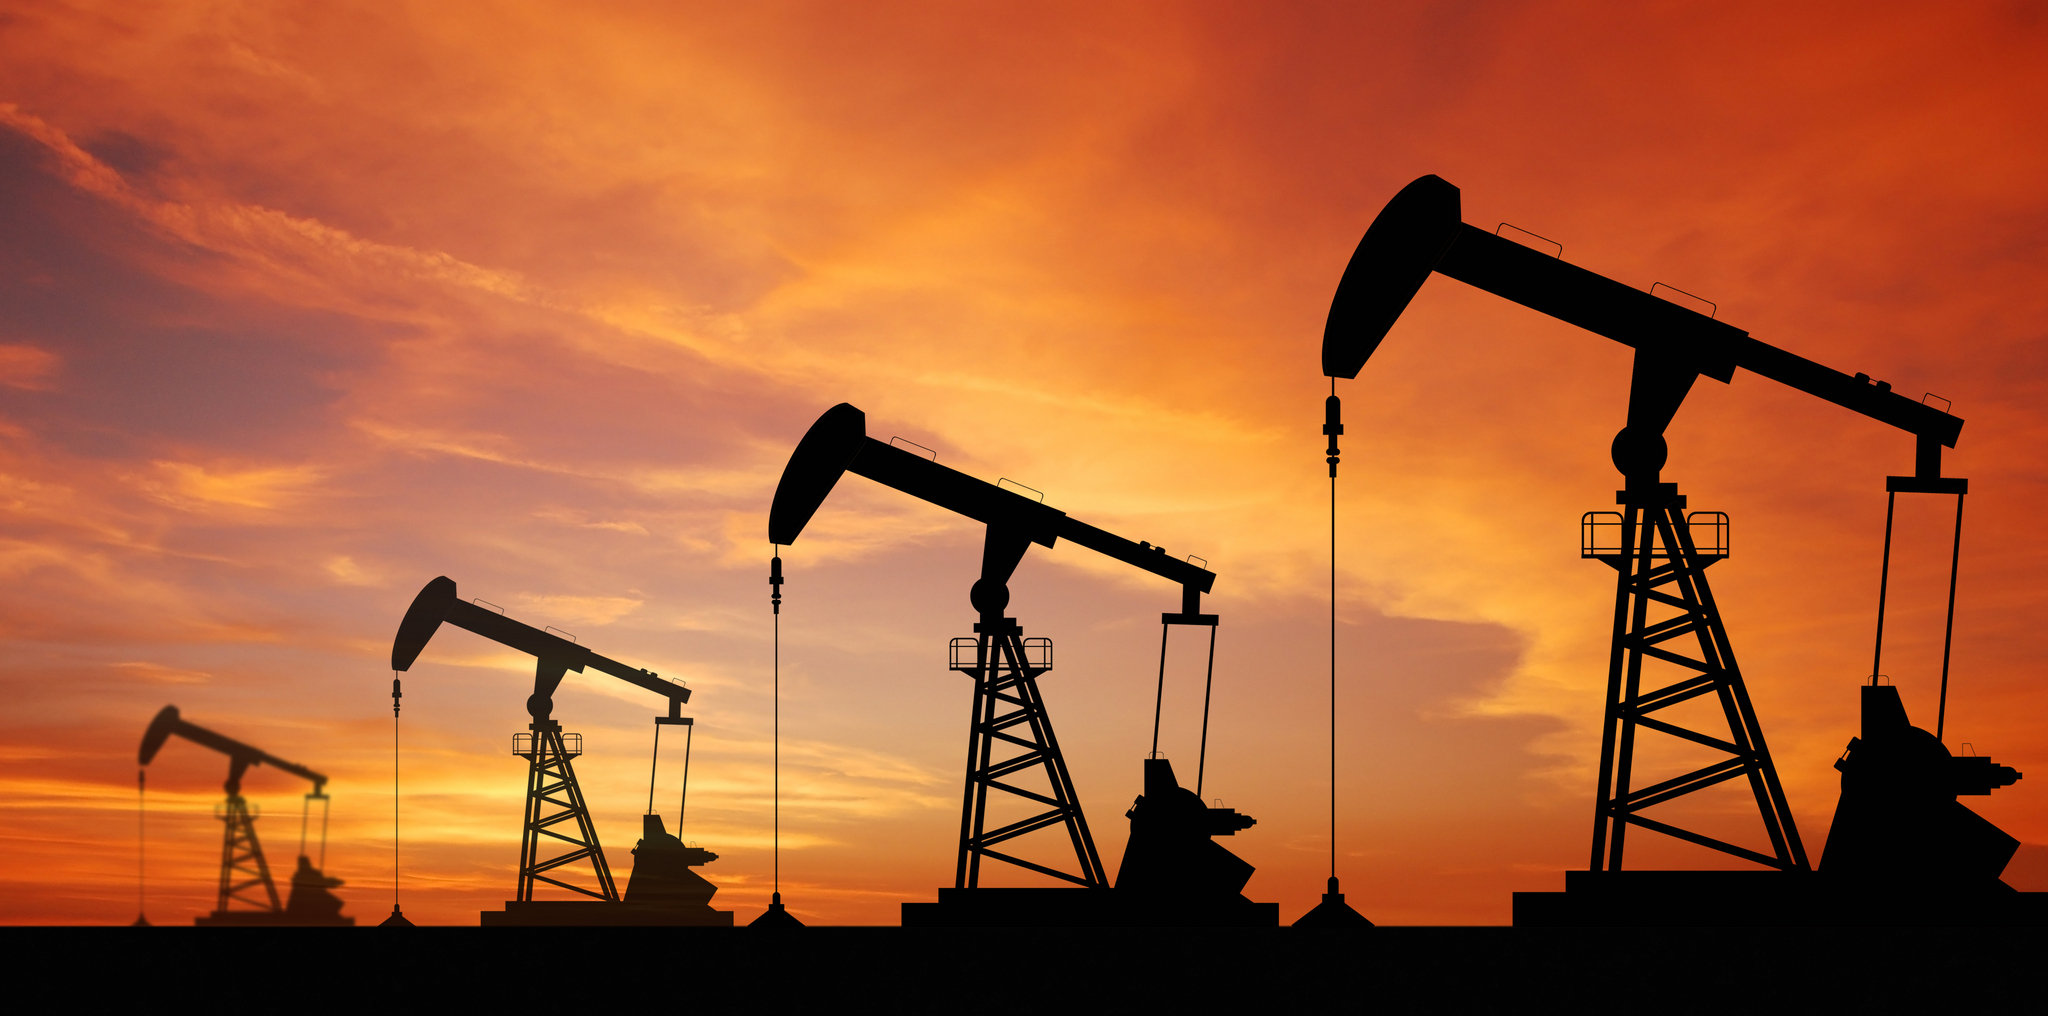 Source: Oil Boom USA